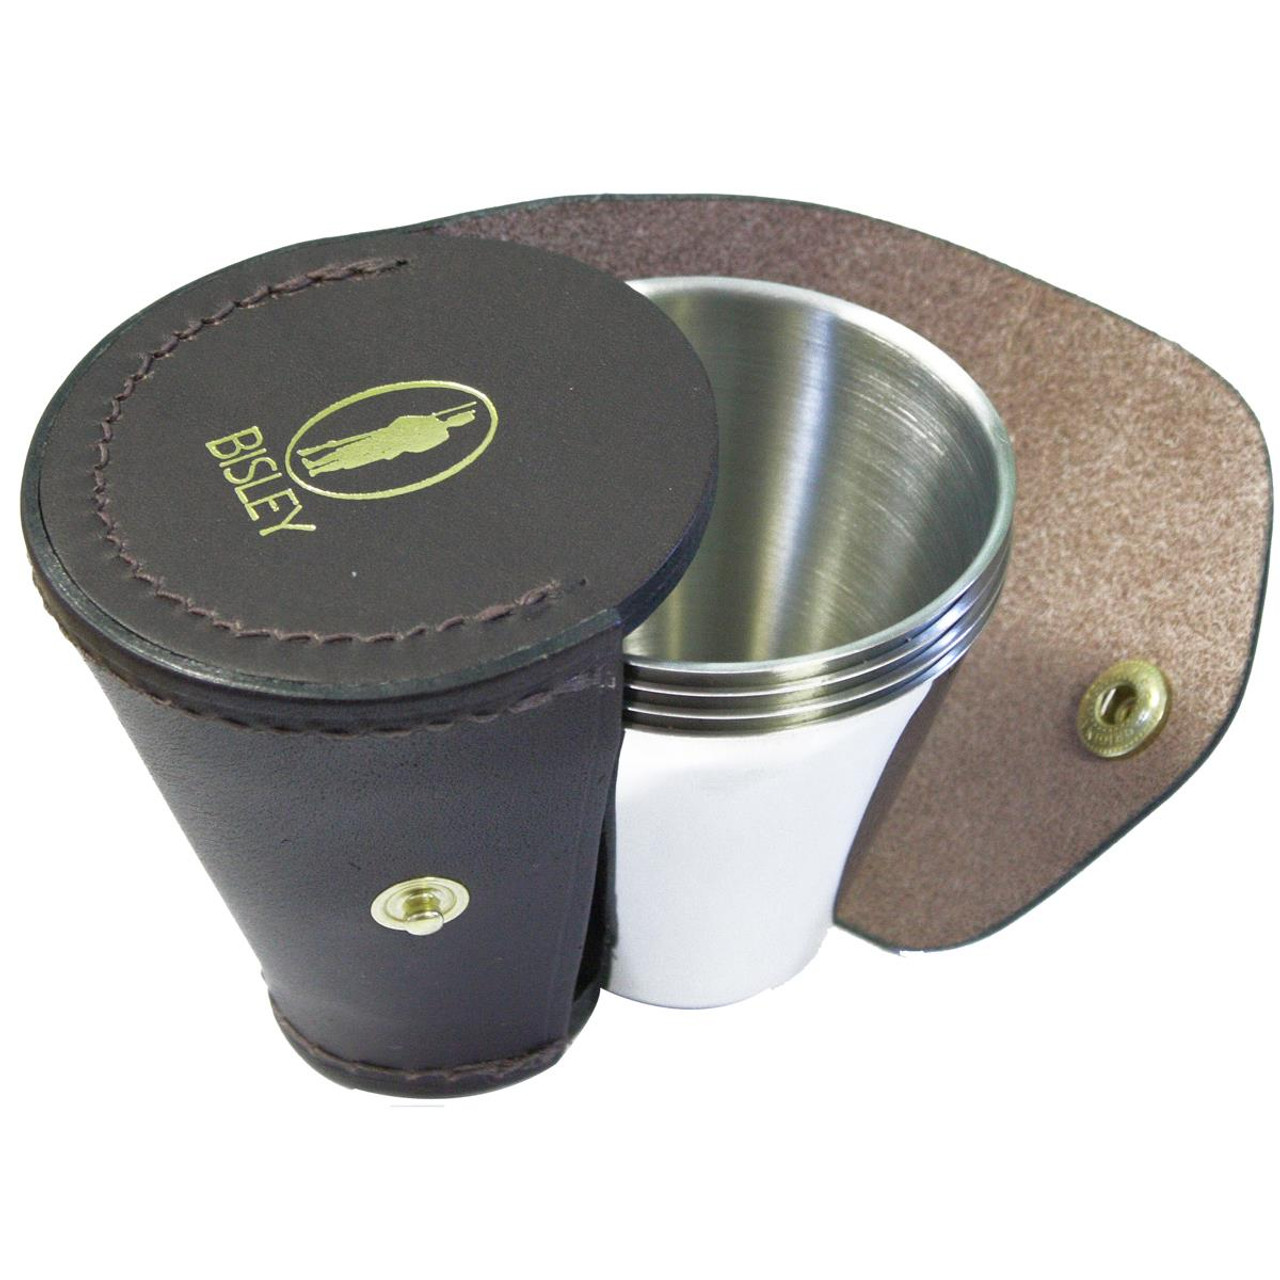 Black Bisley 3.5oz Cup Set Of 4